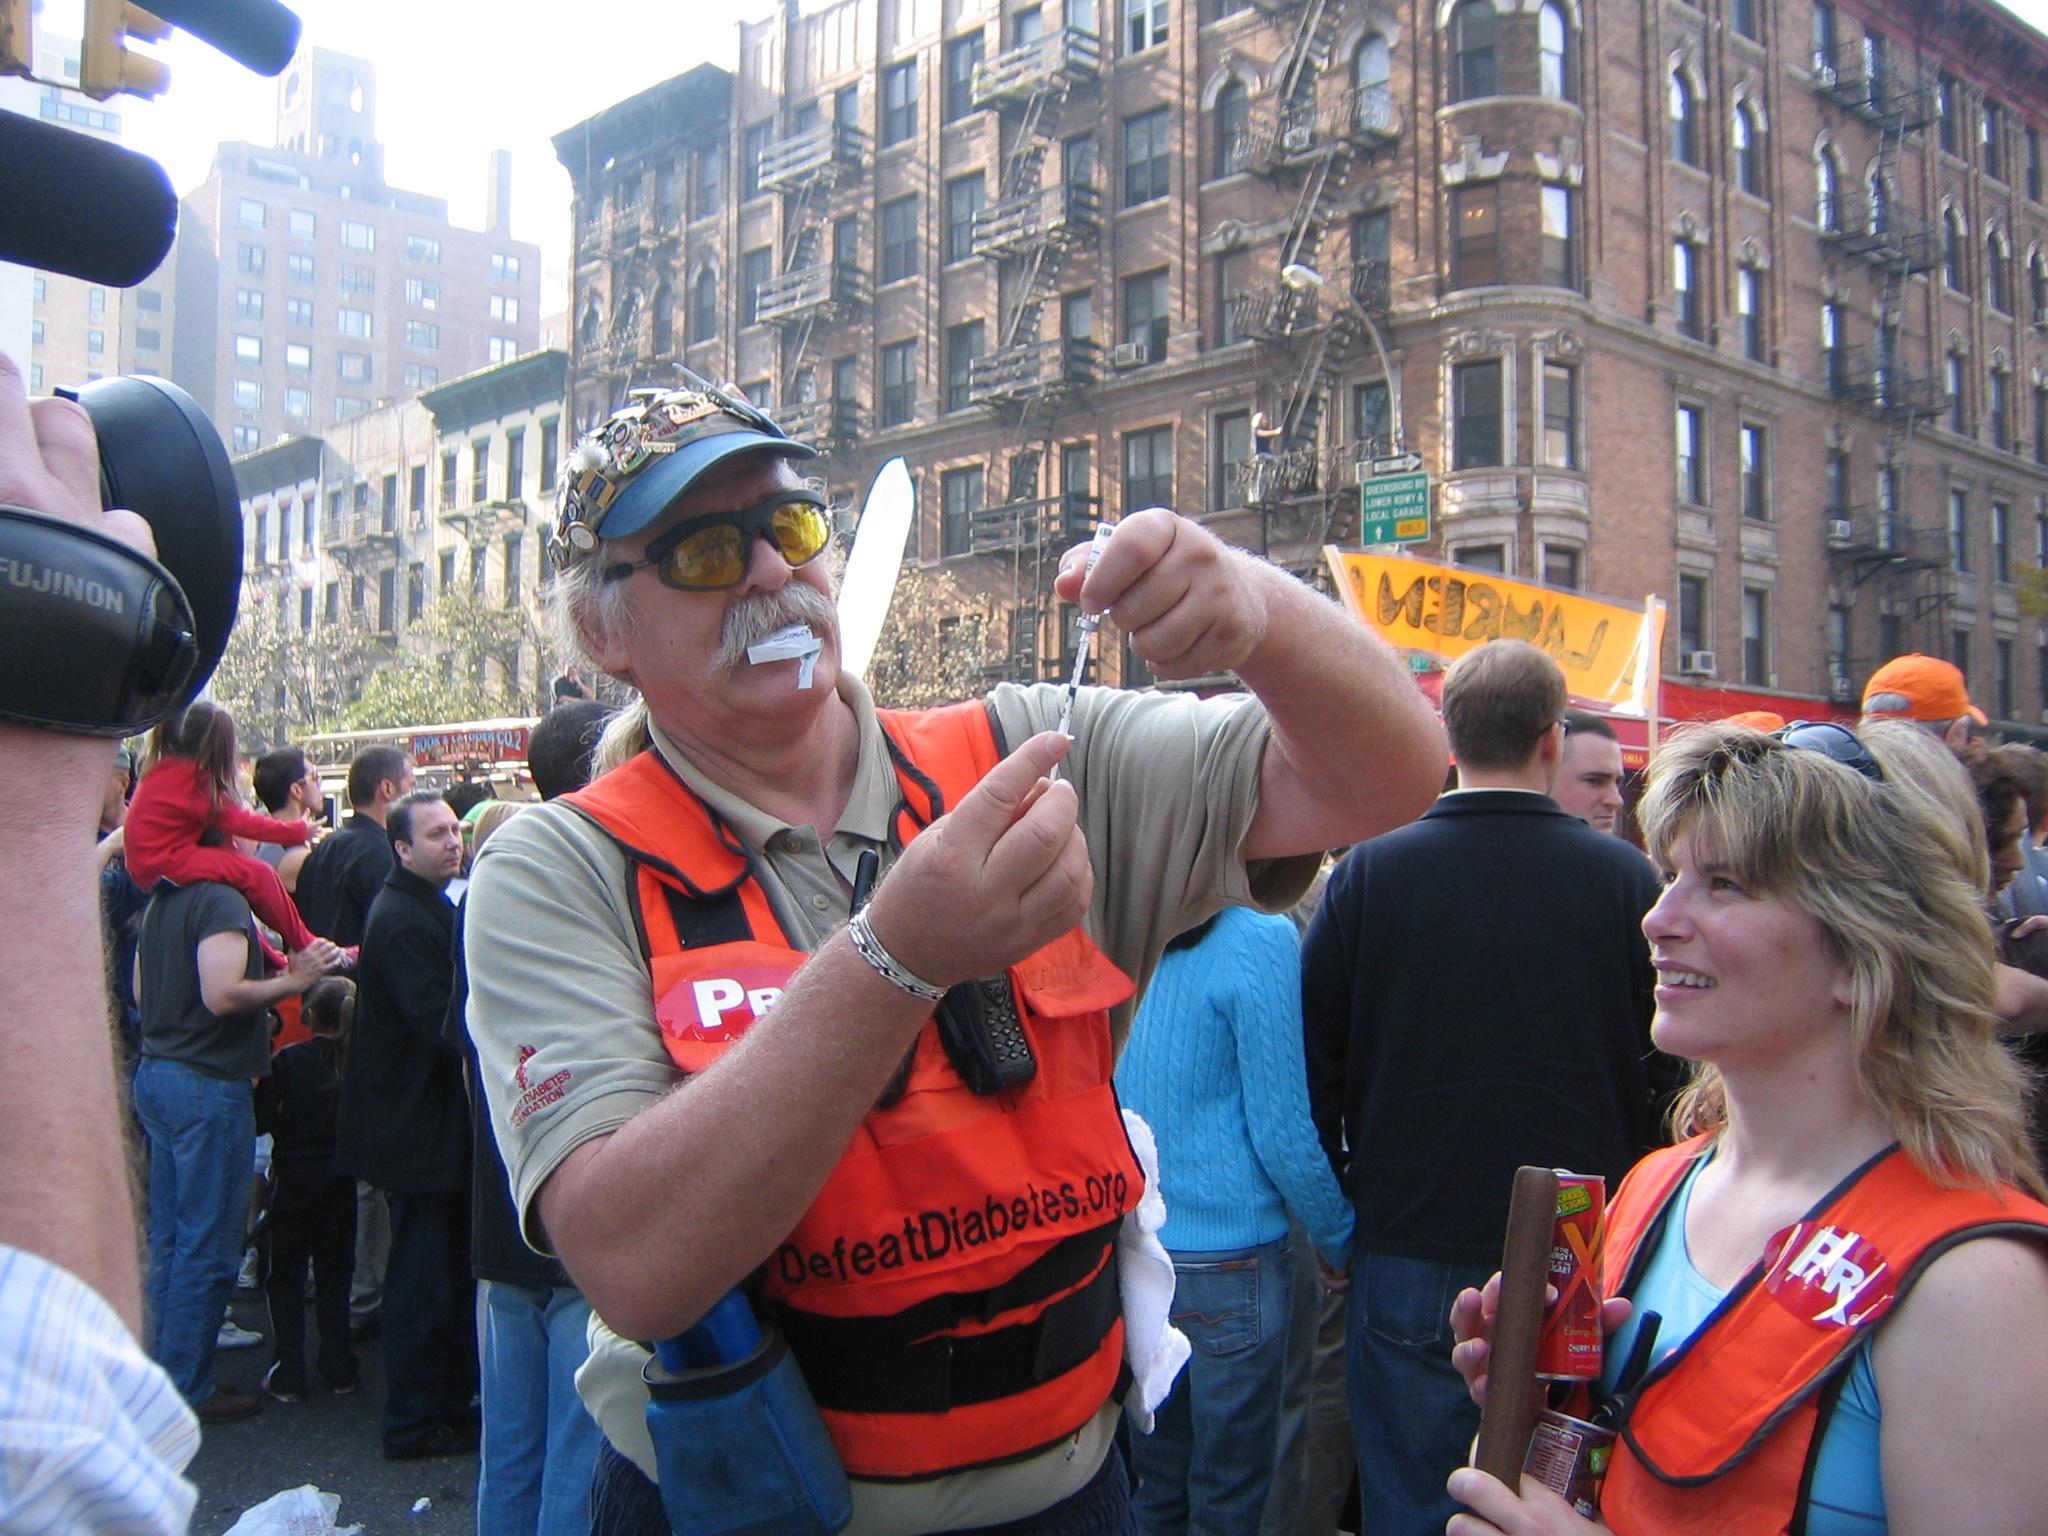 Mr D Insulin Prep NYC marathon